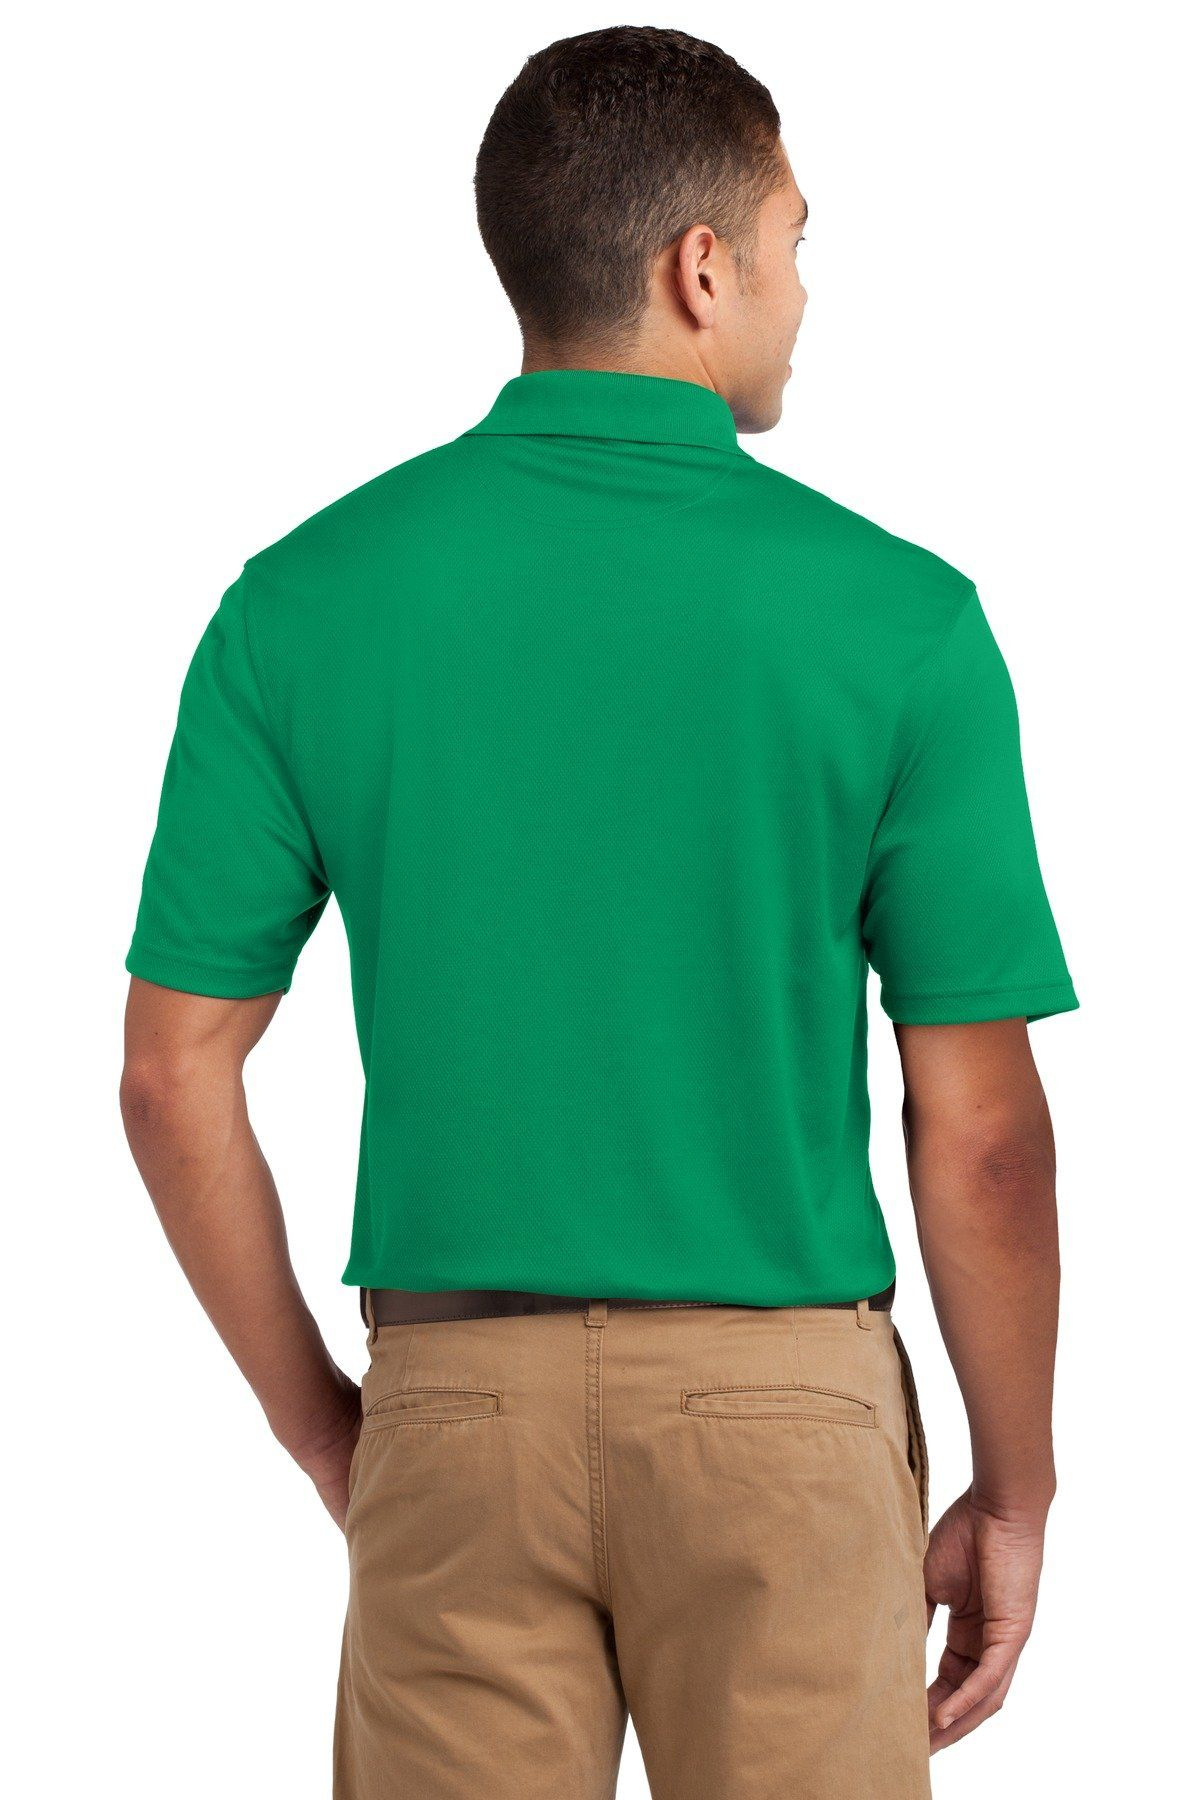 Men Golf Clothing *** SportTek Mens Dri Mesh Polo S Kelly